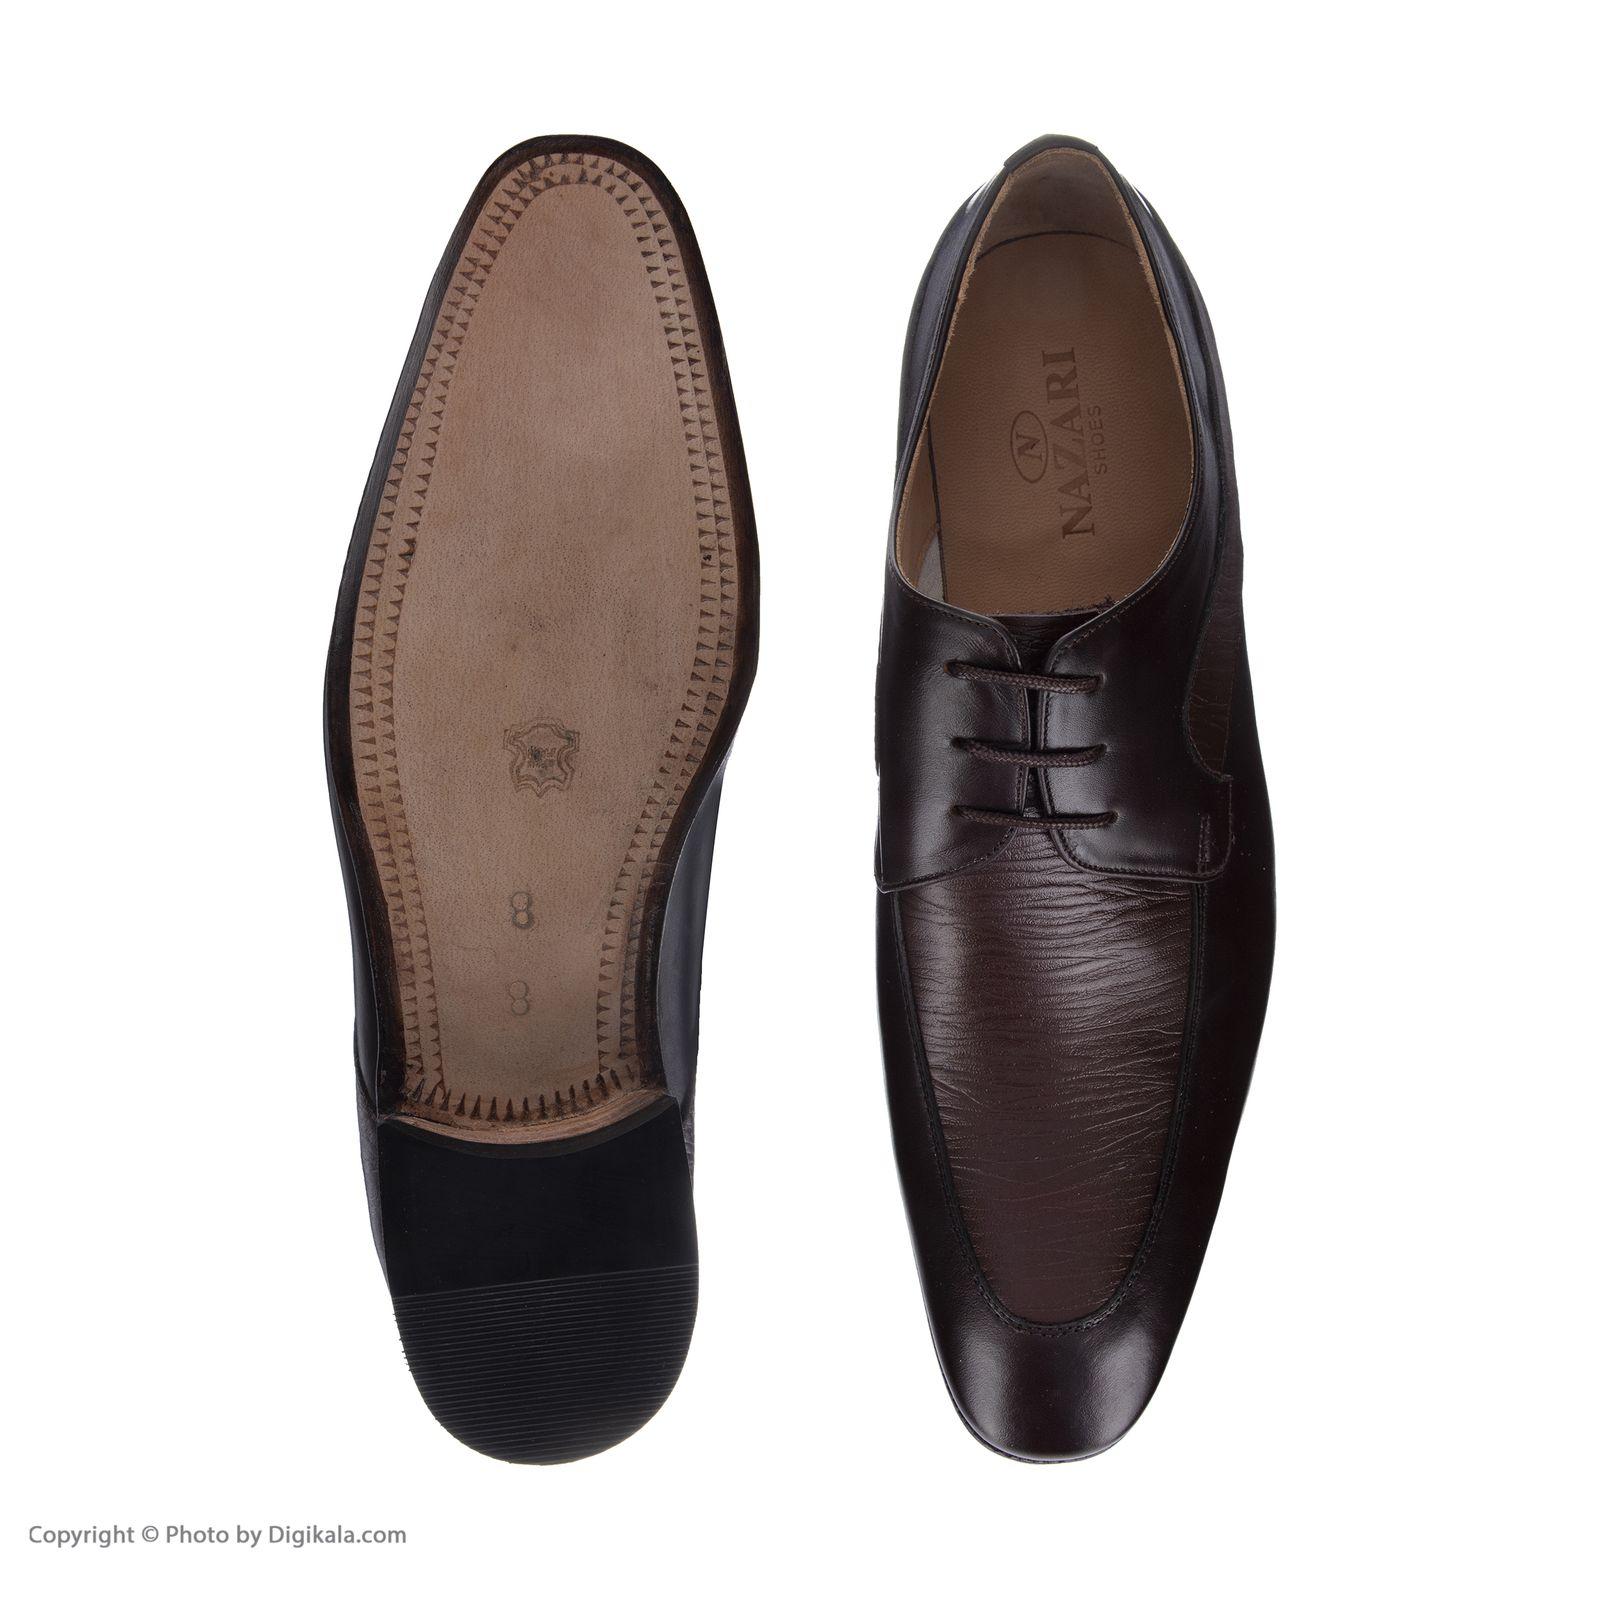 کفش مردانه نظری کد 429 -  - 5